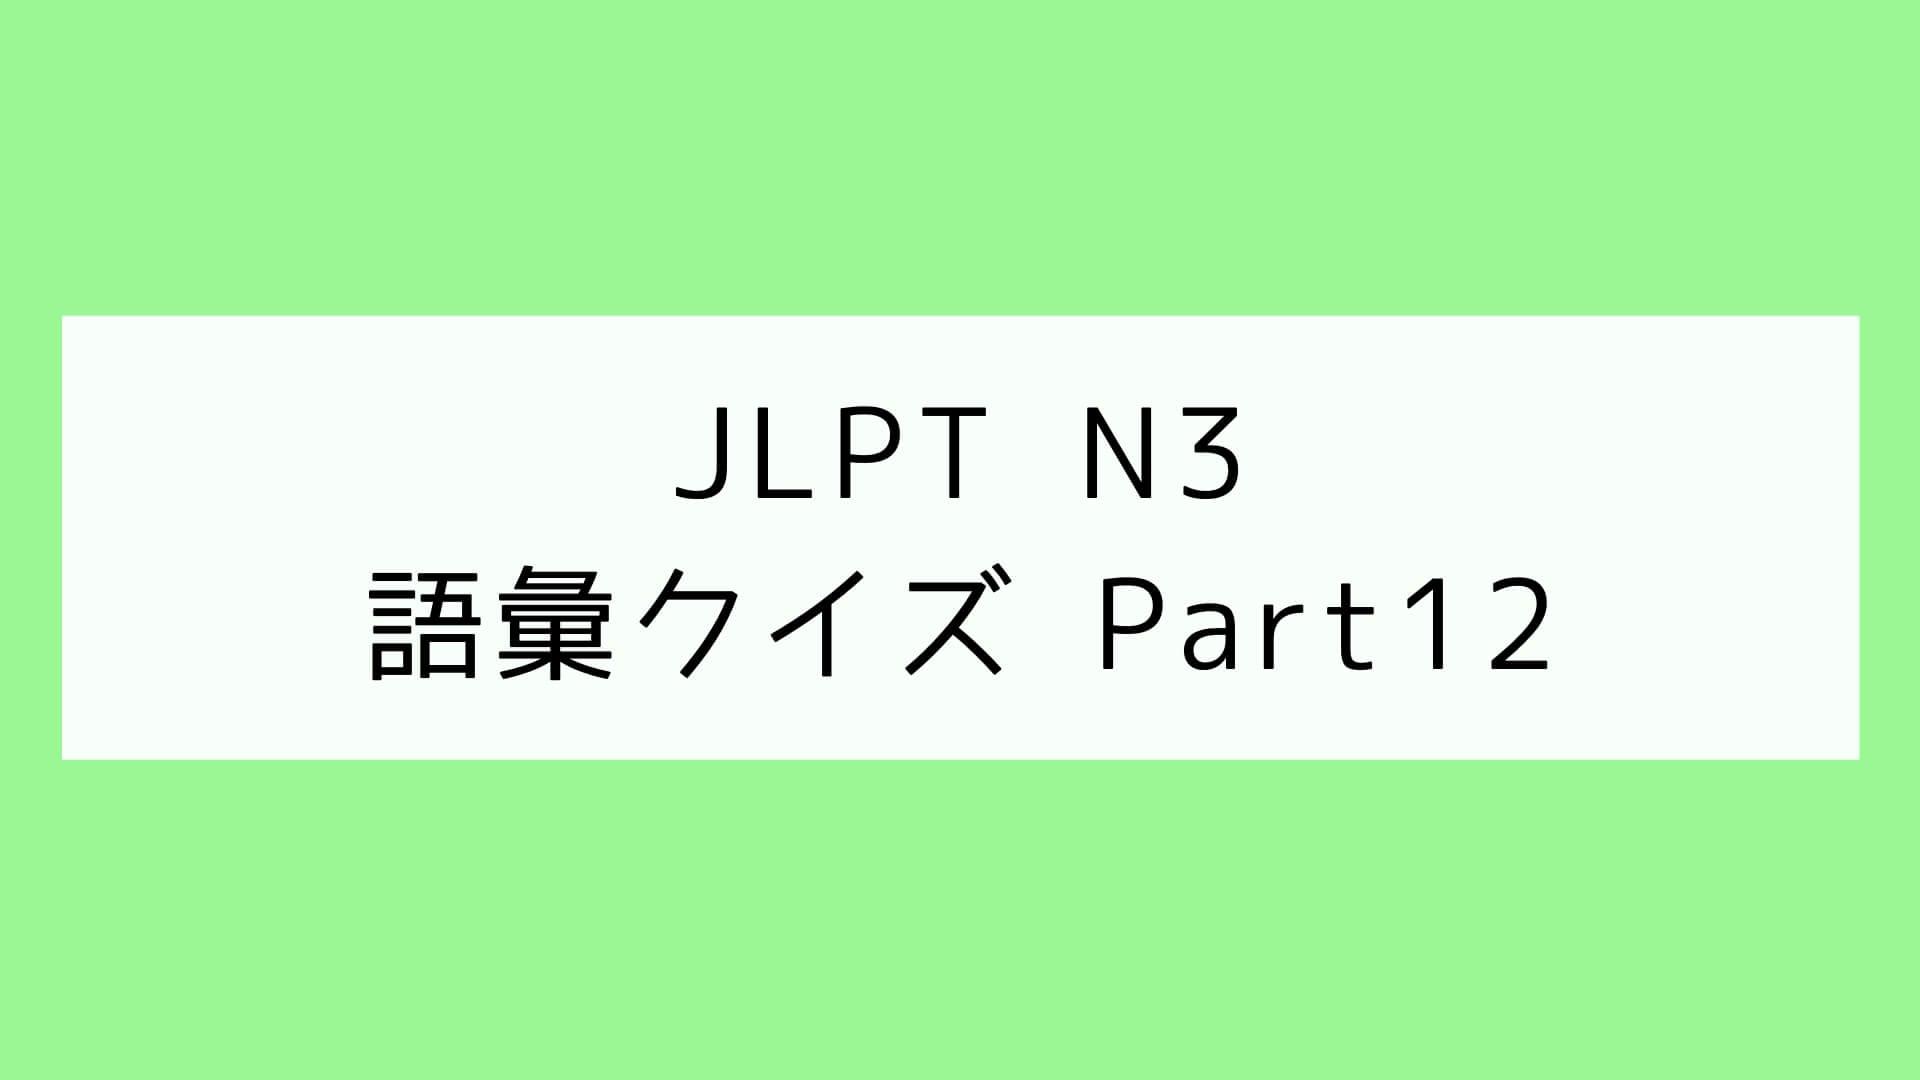 【JLPT N3】語彙クイズ Part12